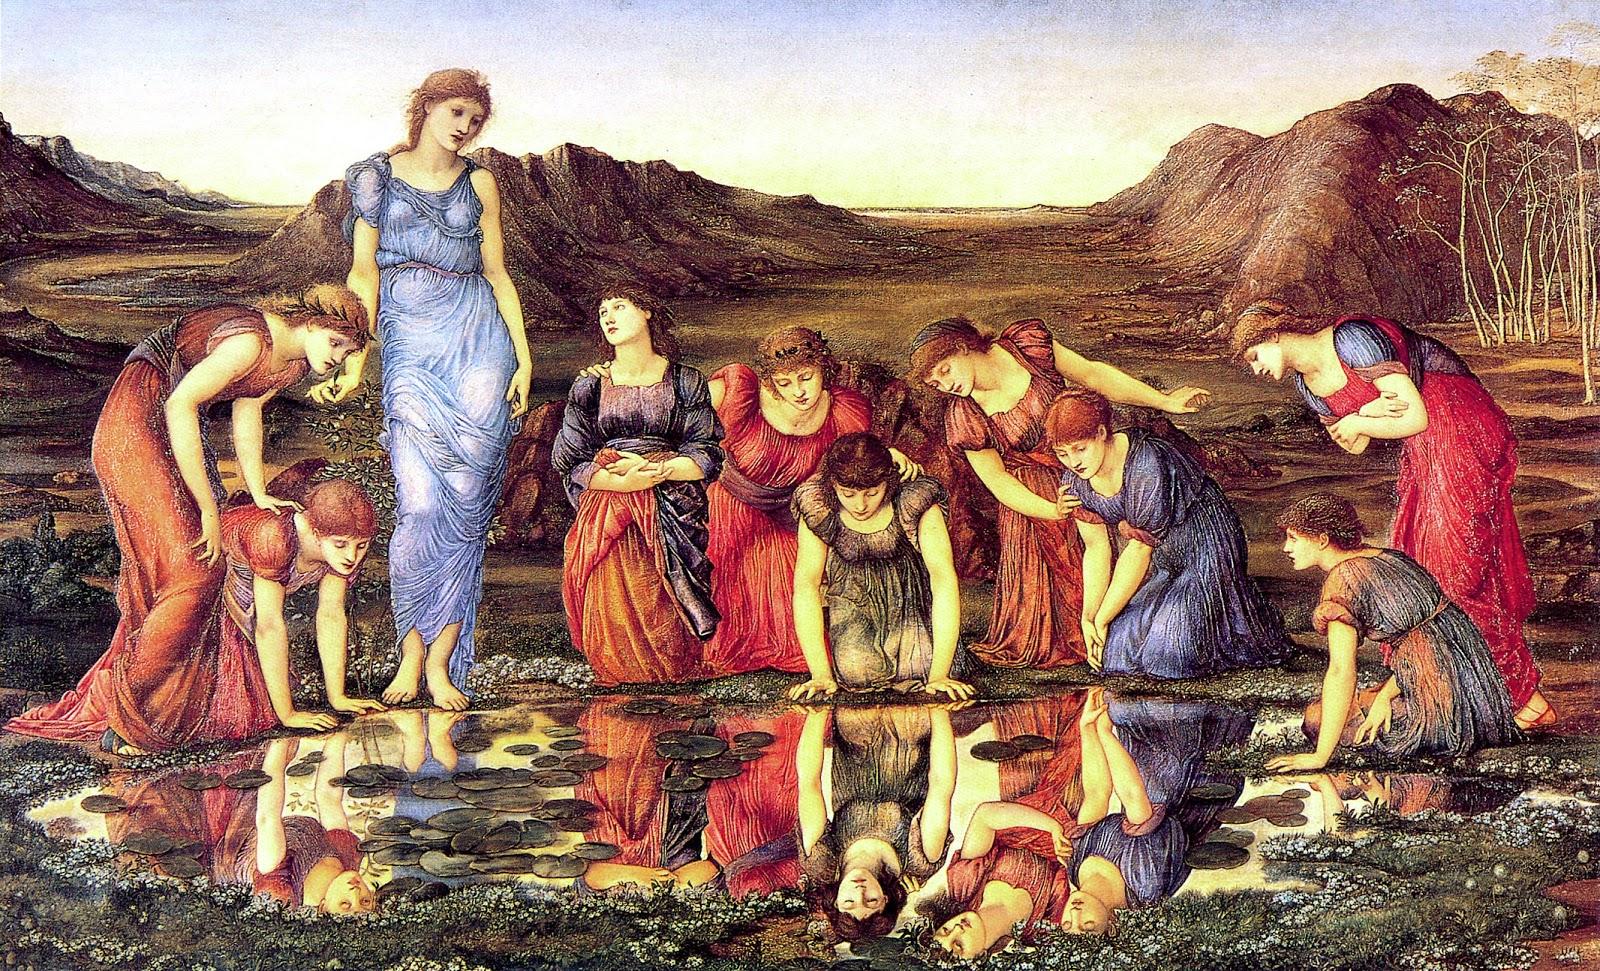 Edward Burne-Jones,The Mirror of Venus